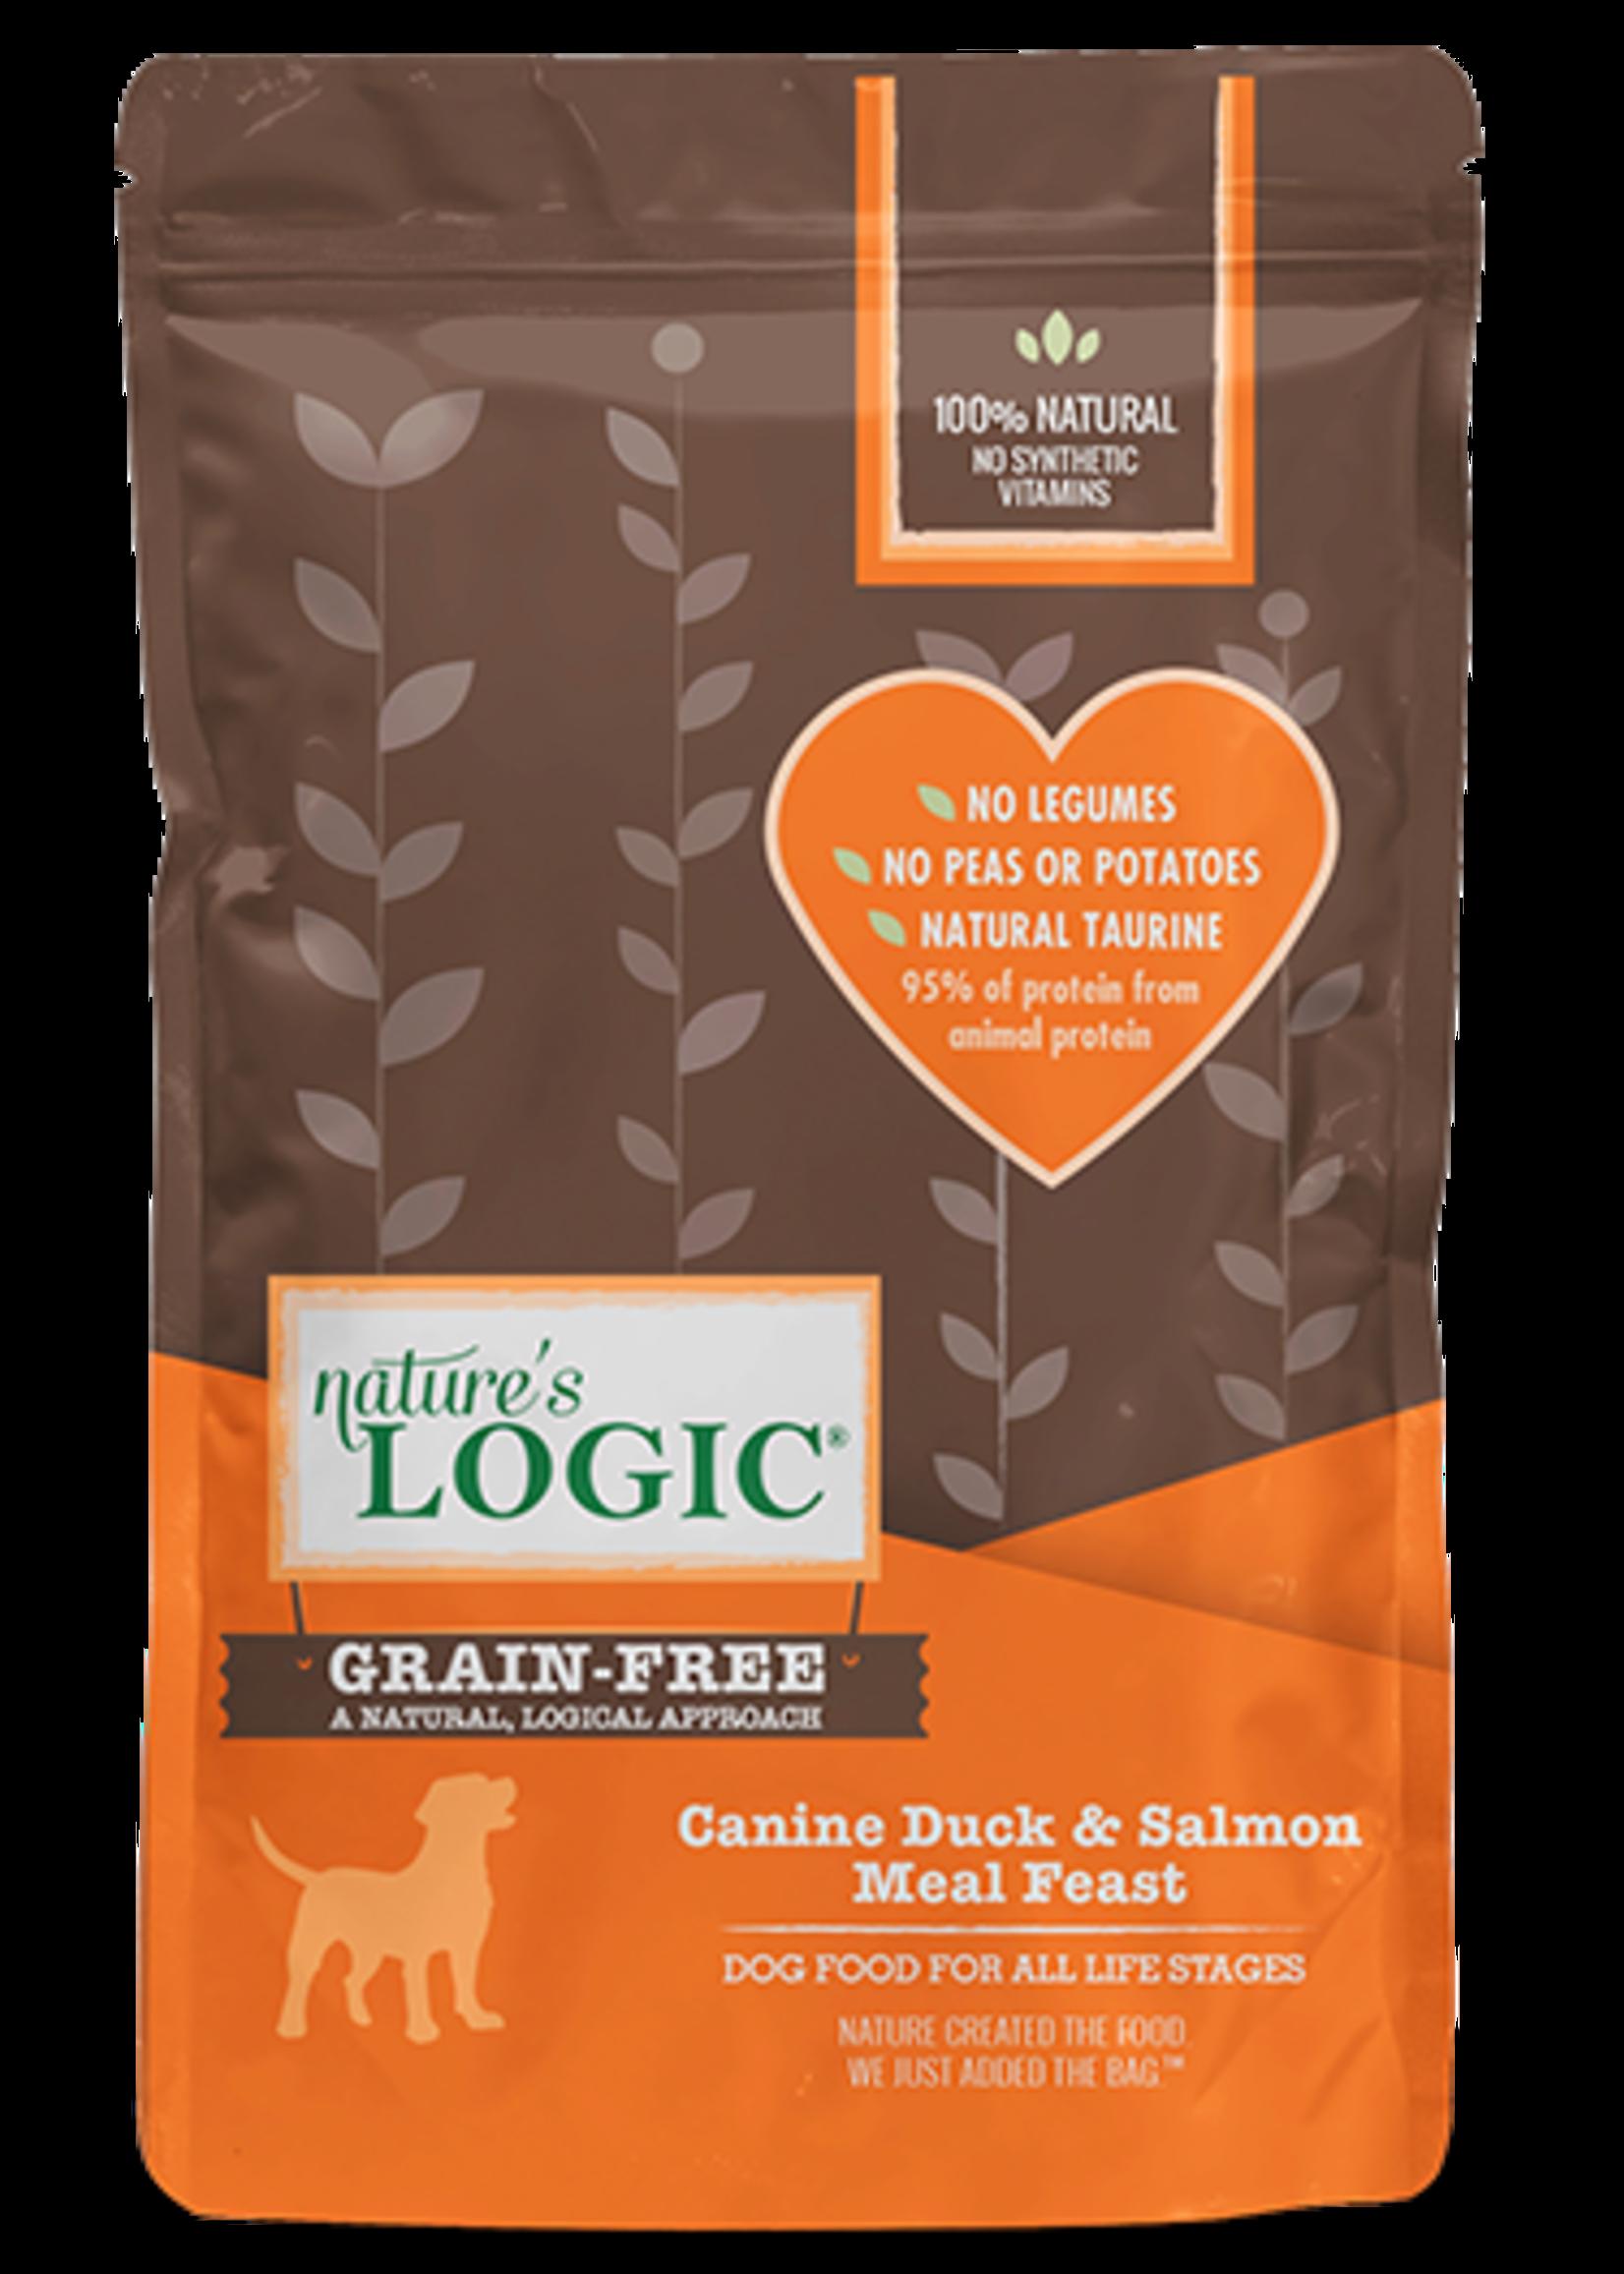 Nature's Logic Nature's Logic Canine Duck & Salmon Meal Feast Grain-Free Dry Dog Food 4.4lbs